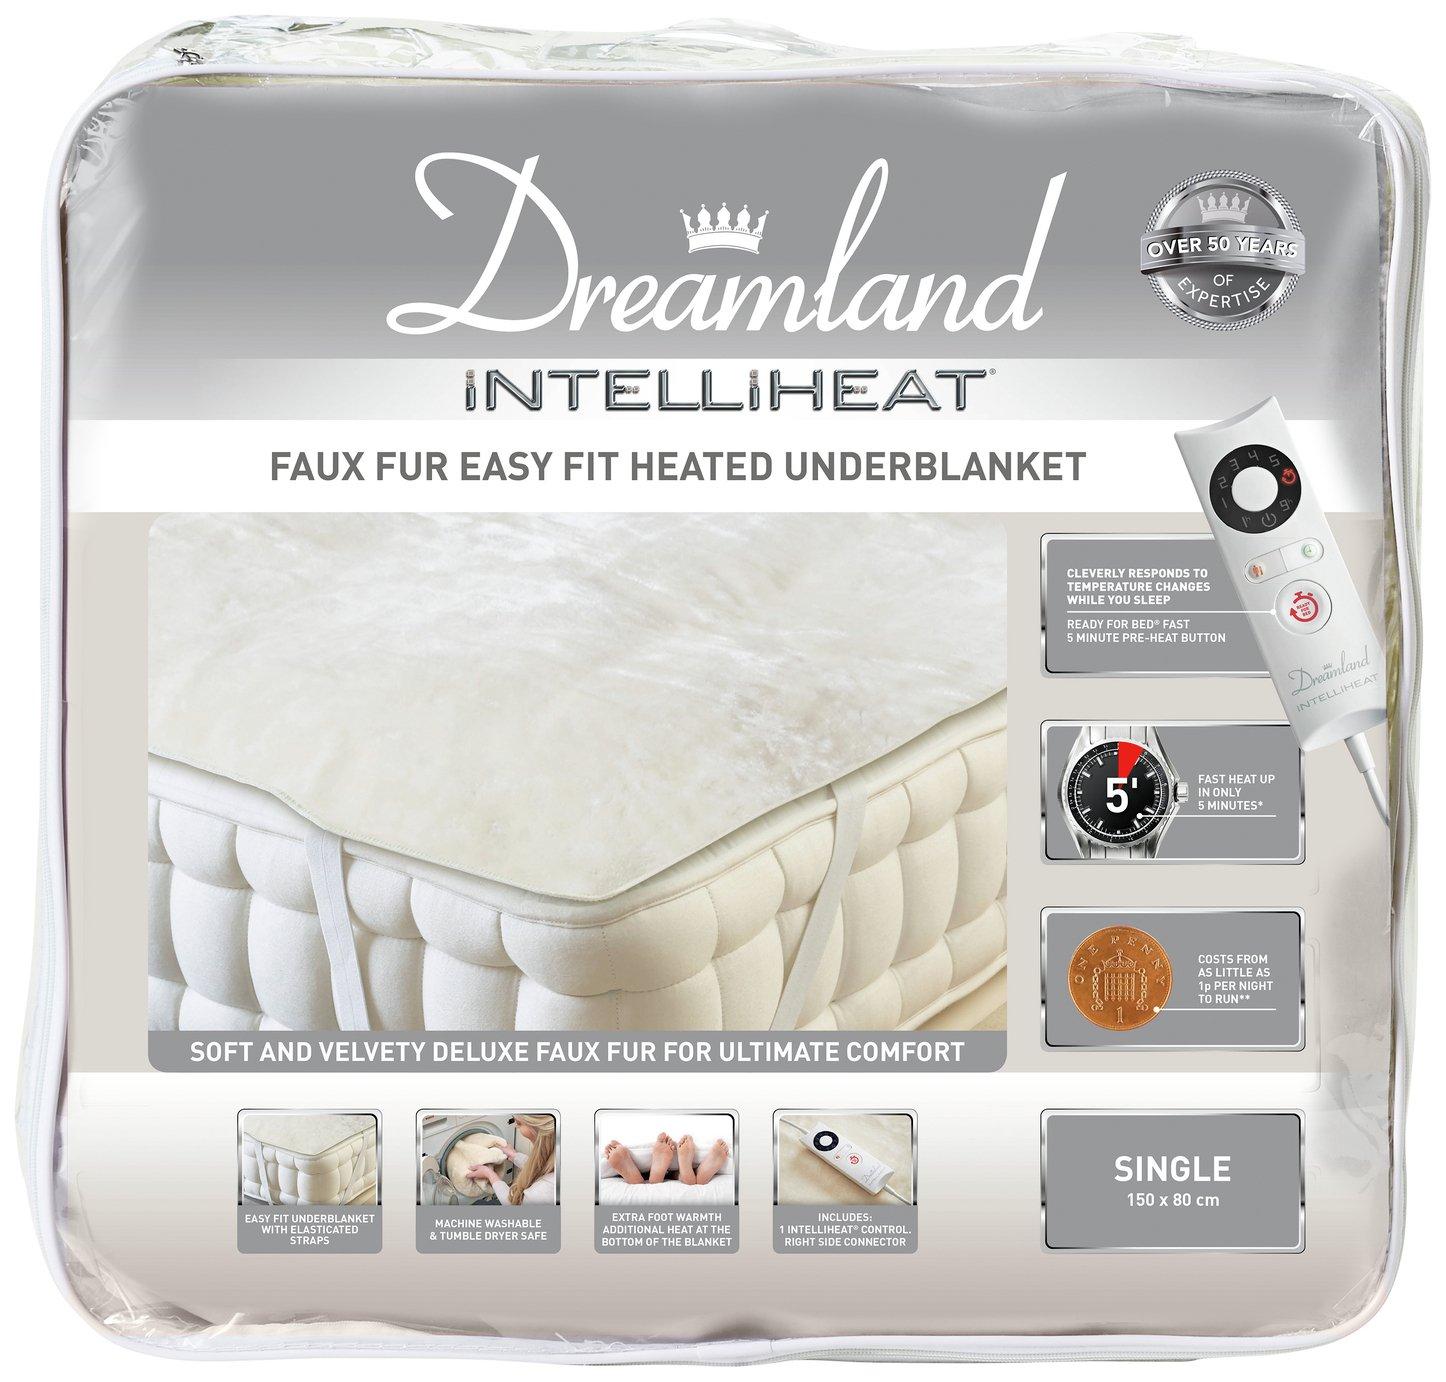 Dreamland Intelliheat Faux Fur Underblanket - Single